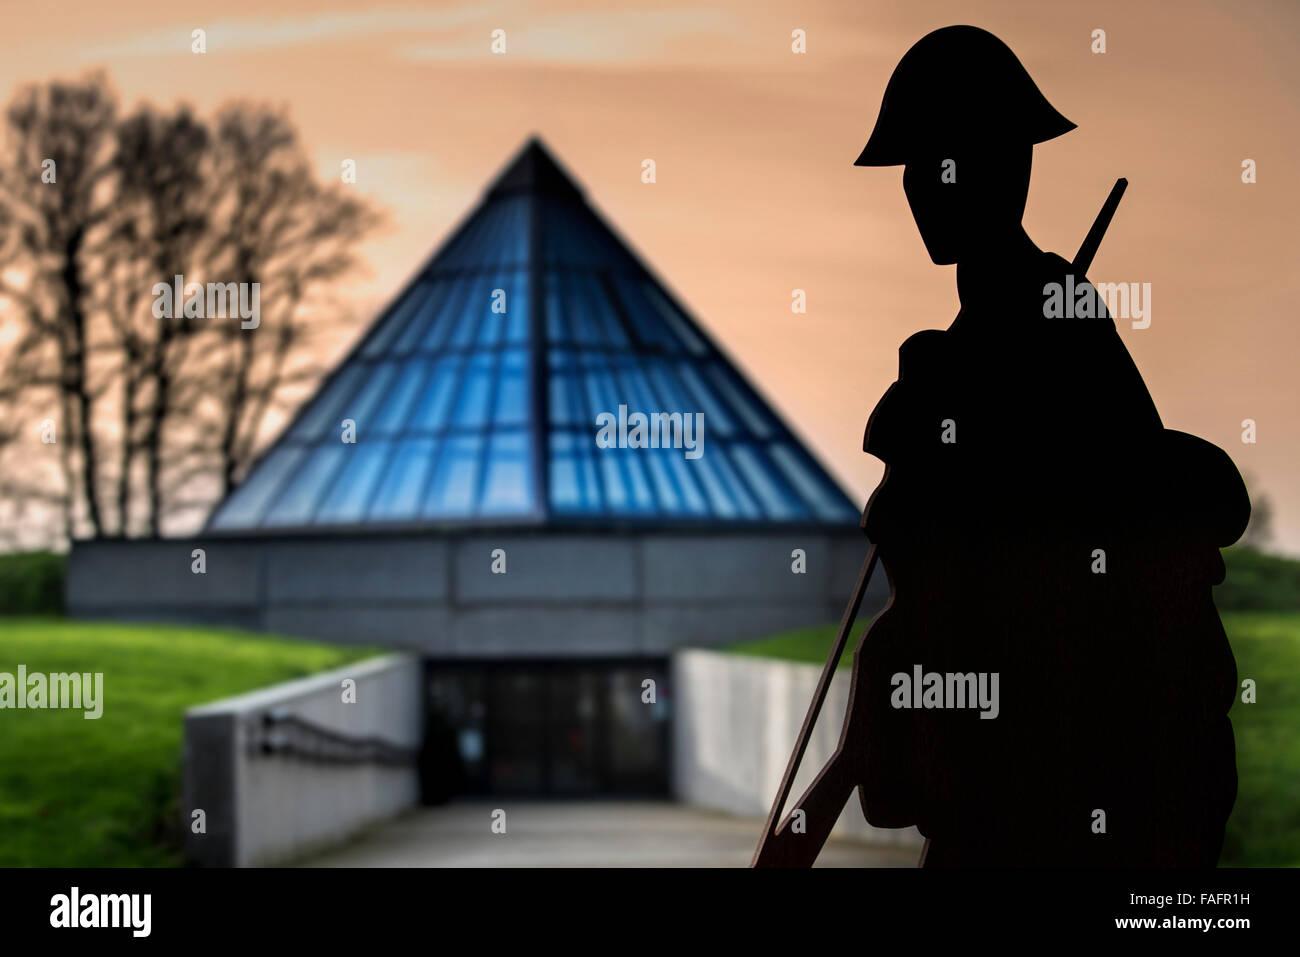 Plugstreet 14-18 Experience, First World War Interpretation Centre at Ploegsteert, West Flanders, Belgium - Stock Image